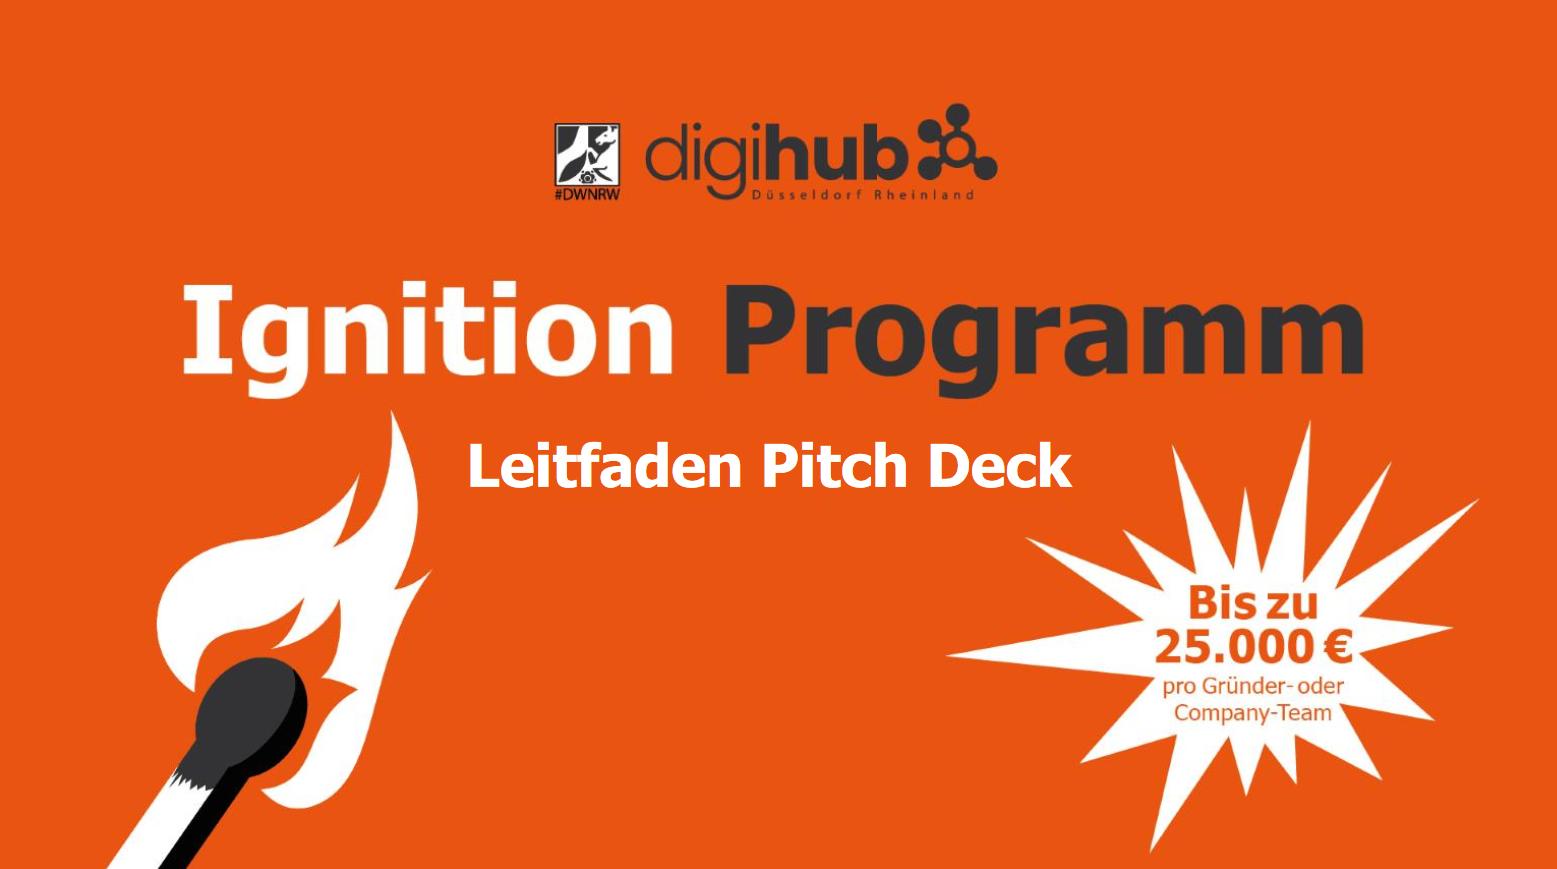 Ignition-Programm-digihub-2019